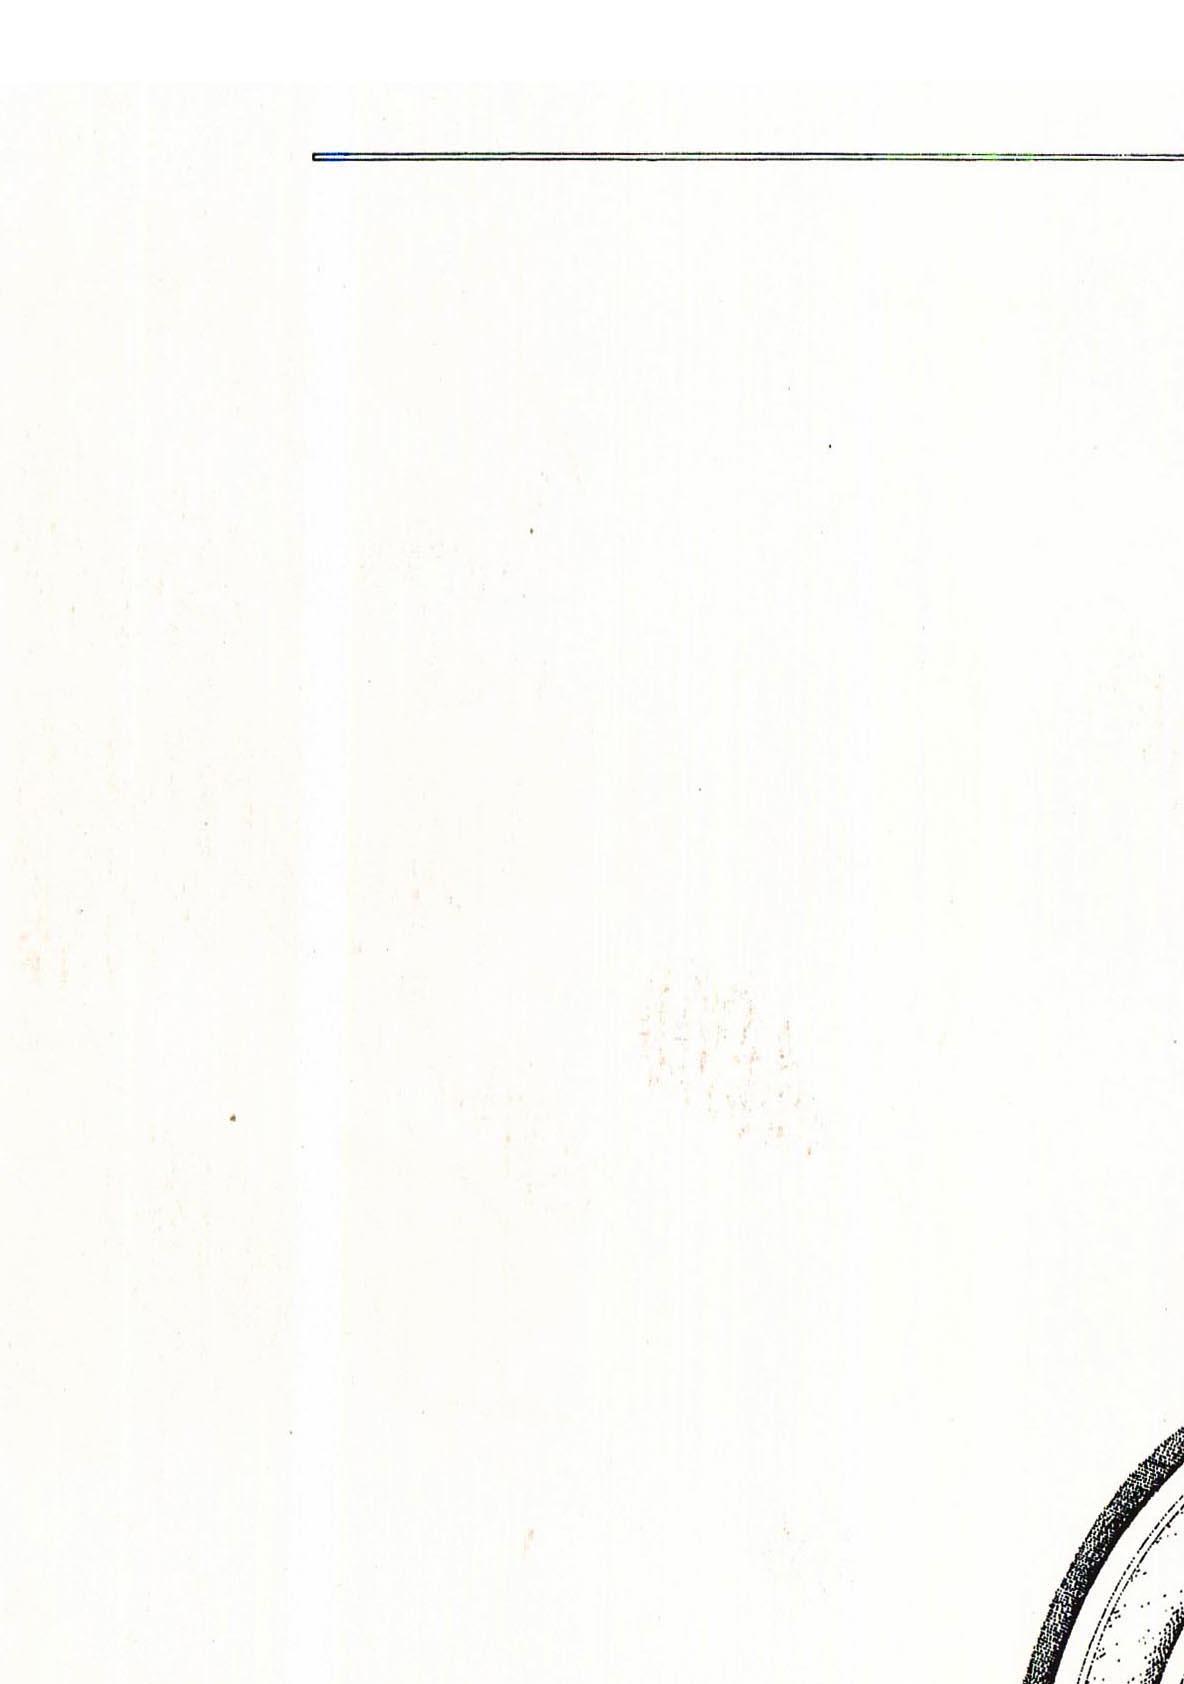 danielvillalobos-valladolid-blueprints-renaissance-a.1